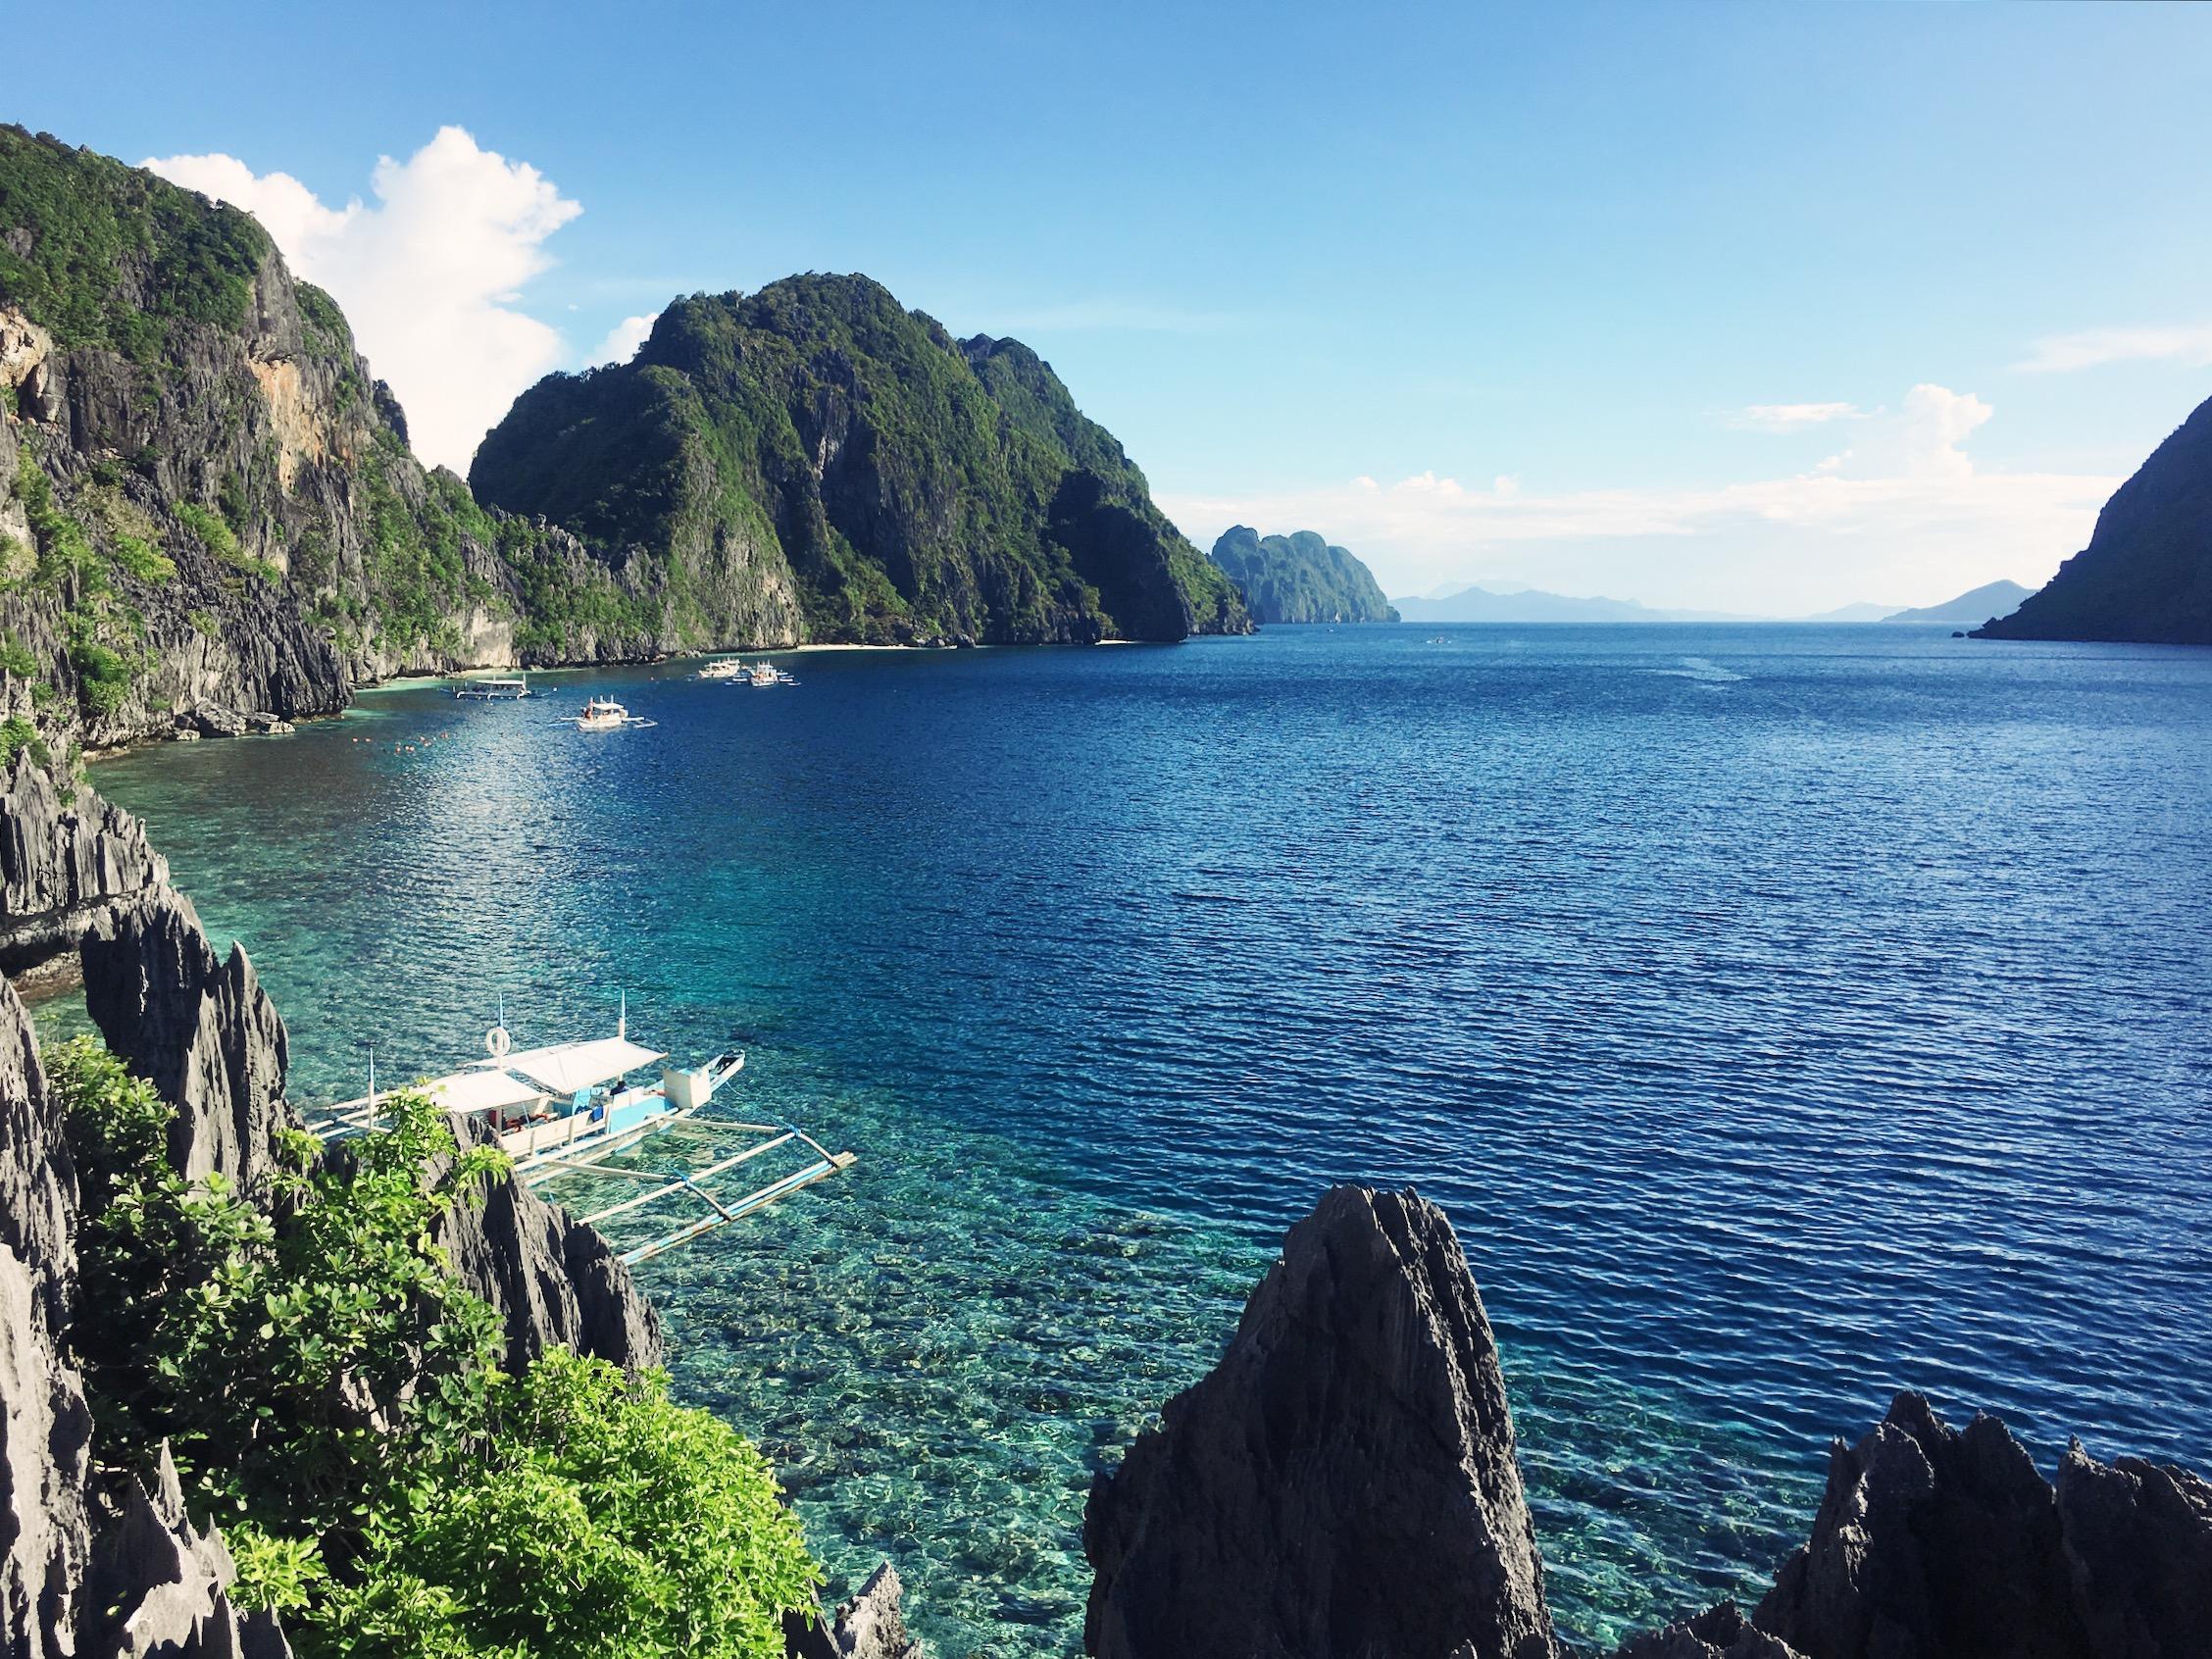 Matinloc Island, El Nido, Palawan